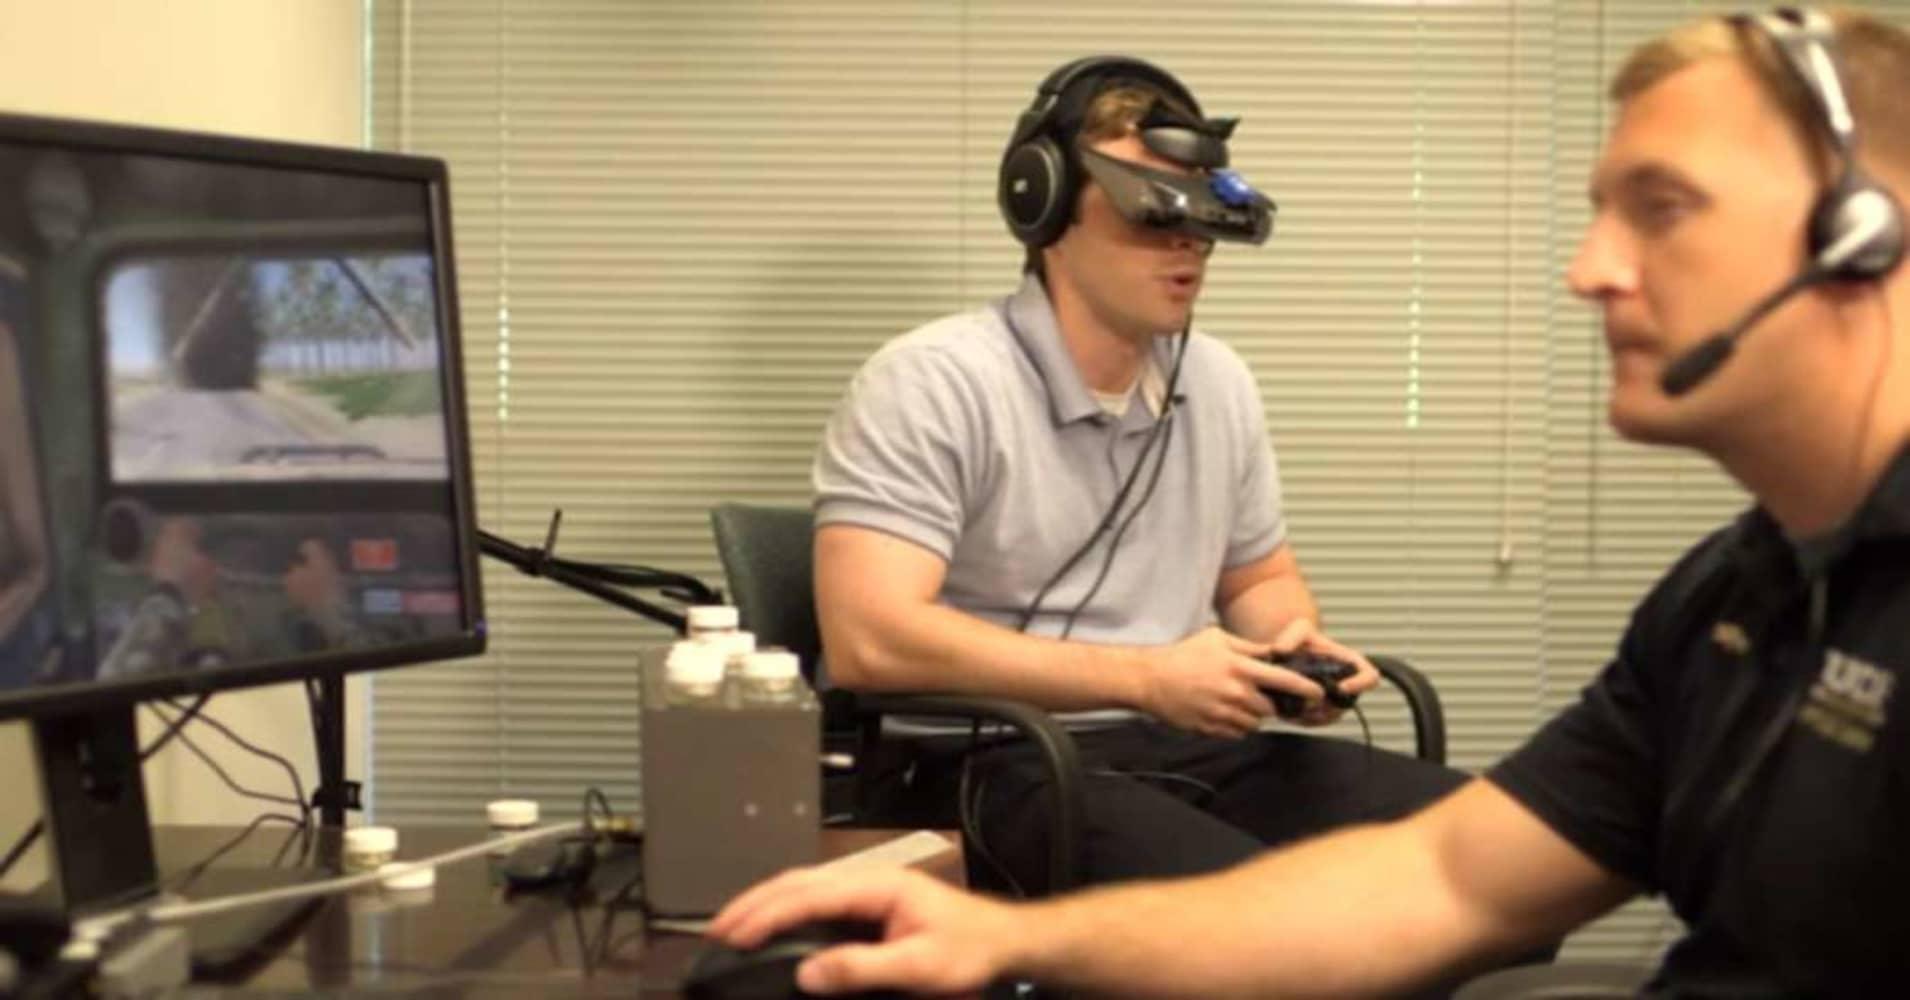 Orlando clinic develops virtual reality to treat PTSD in veterans